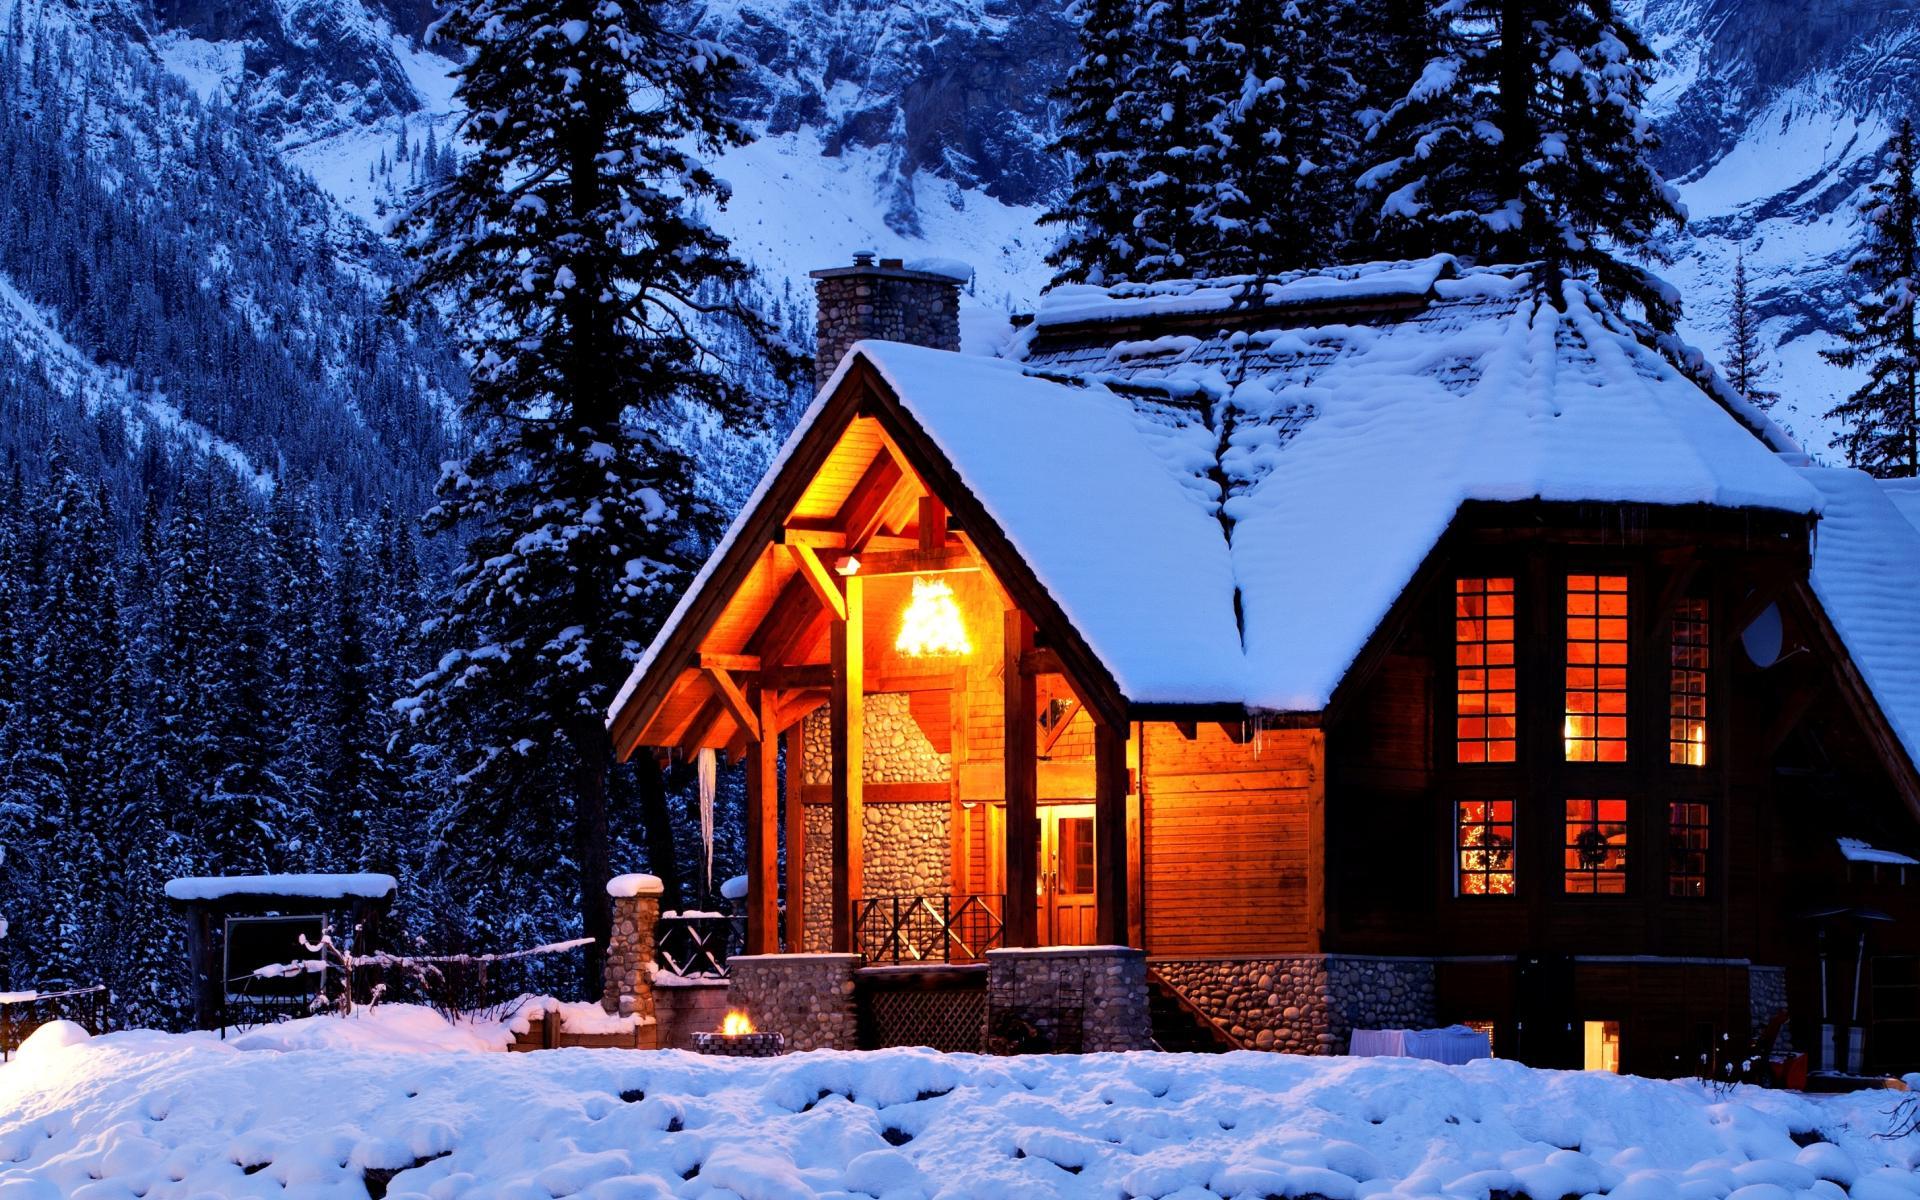 47 Cabin In The Snow Wallpaper On Wallpapersafari